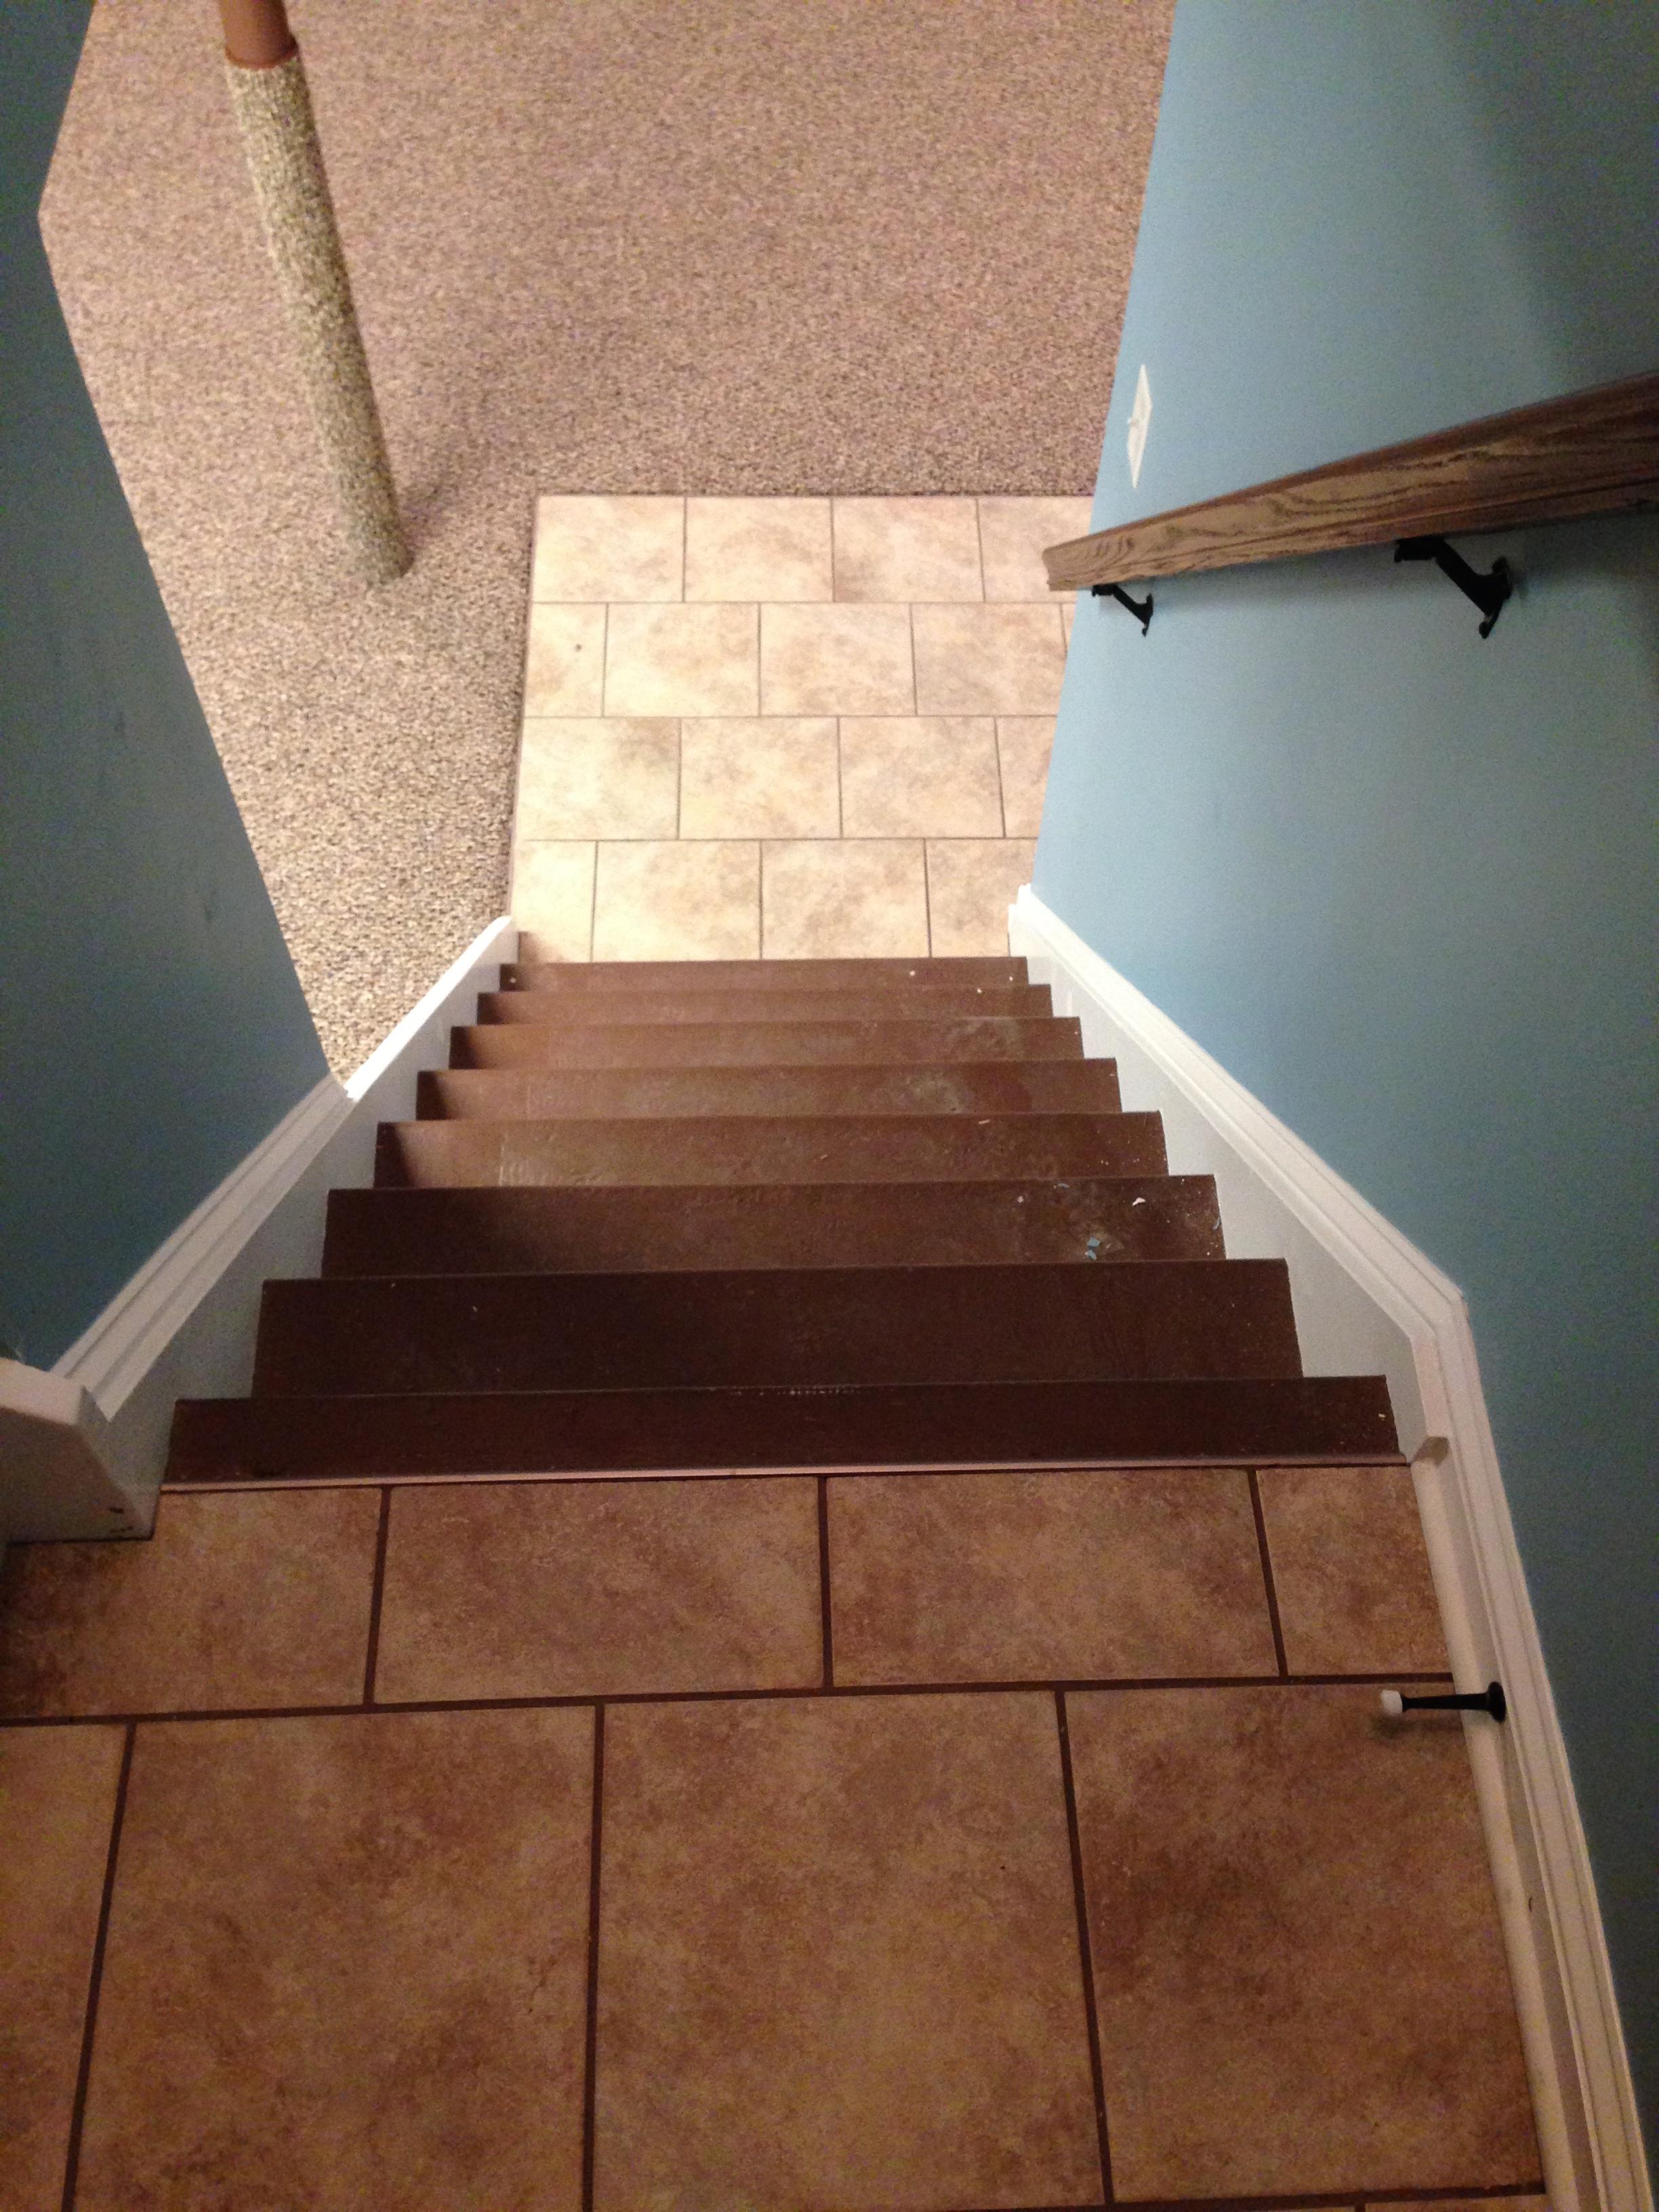 Tiles on Stair Landing